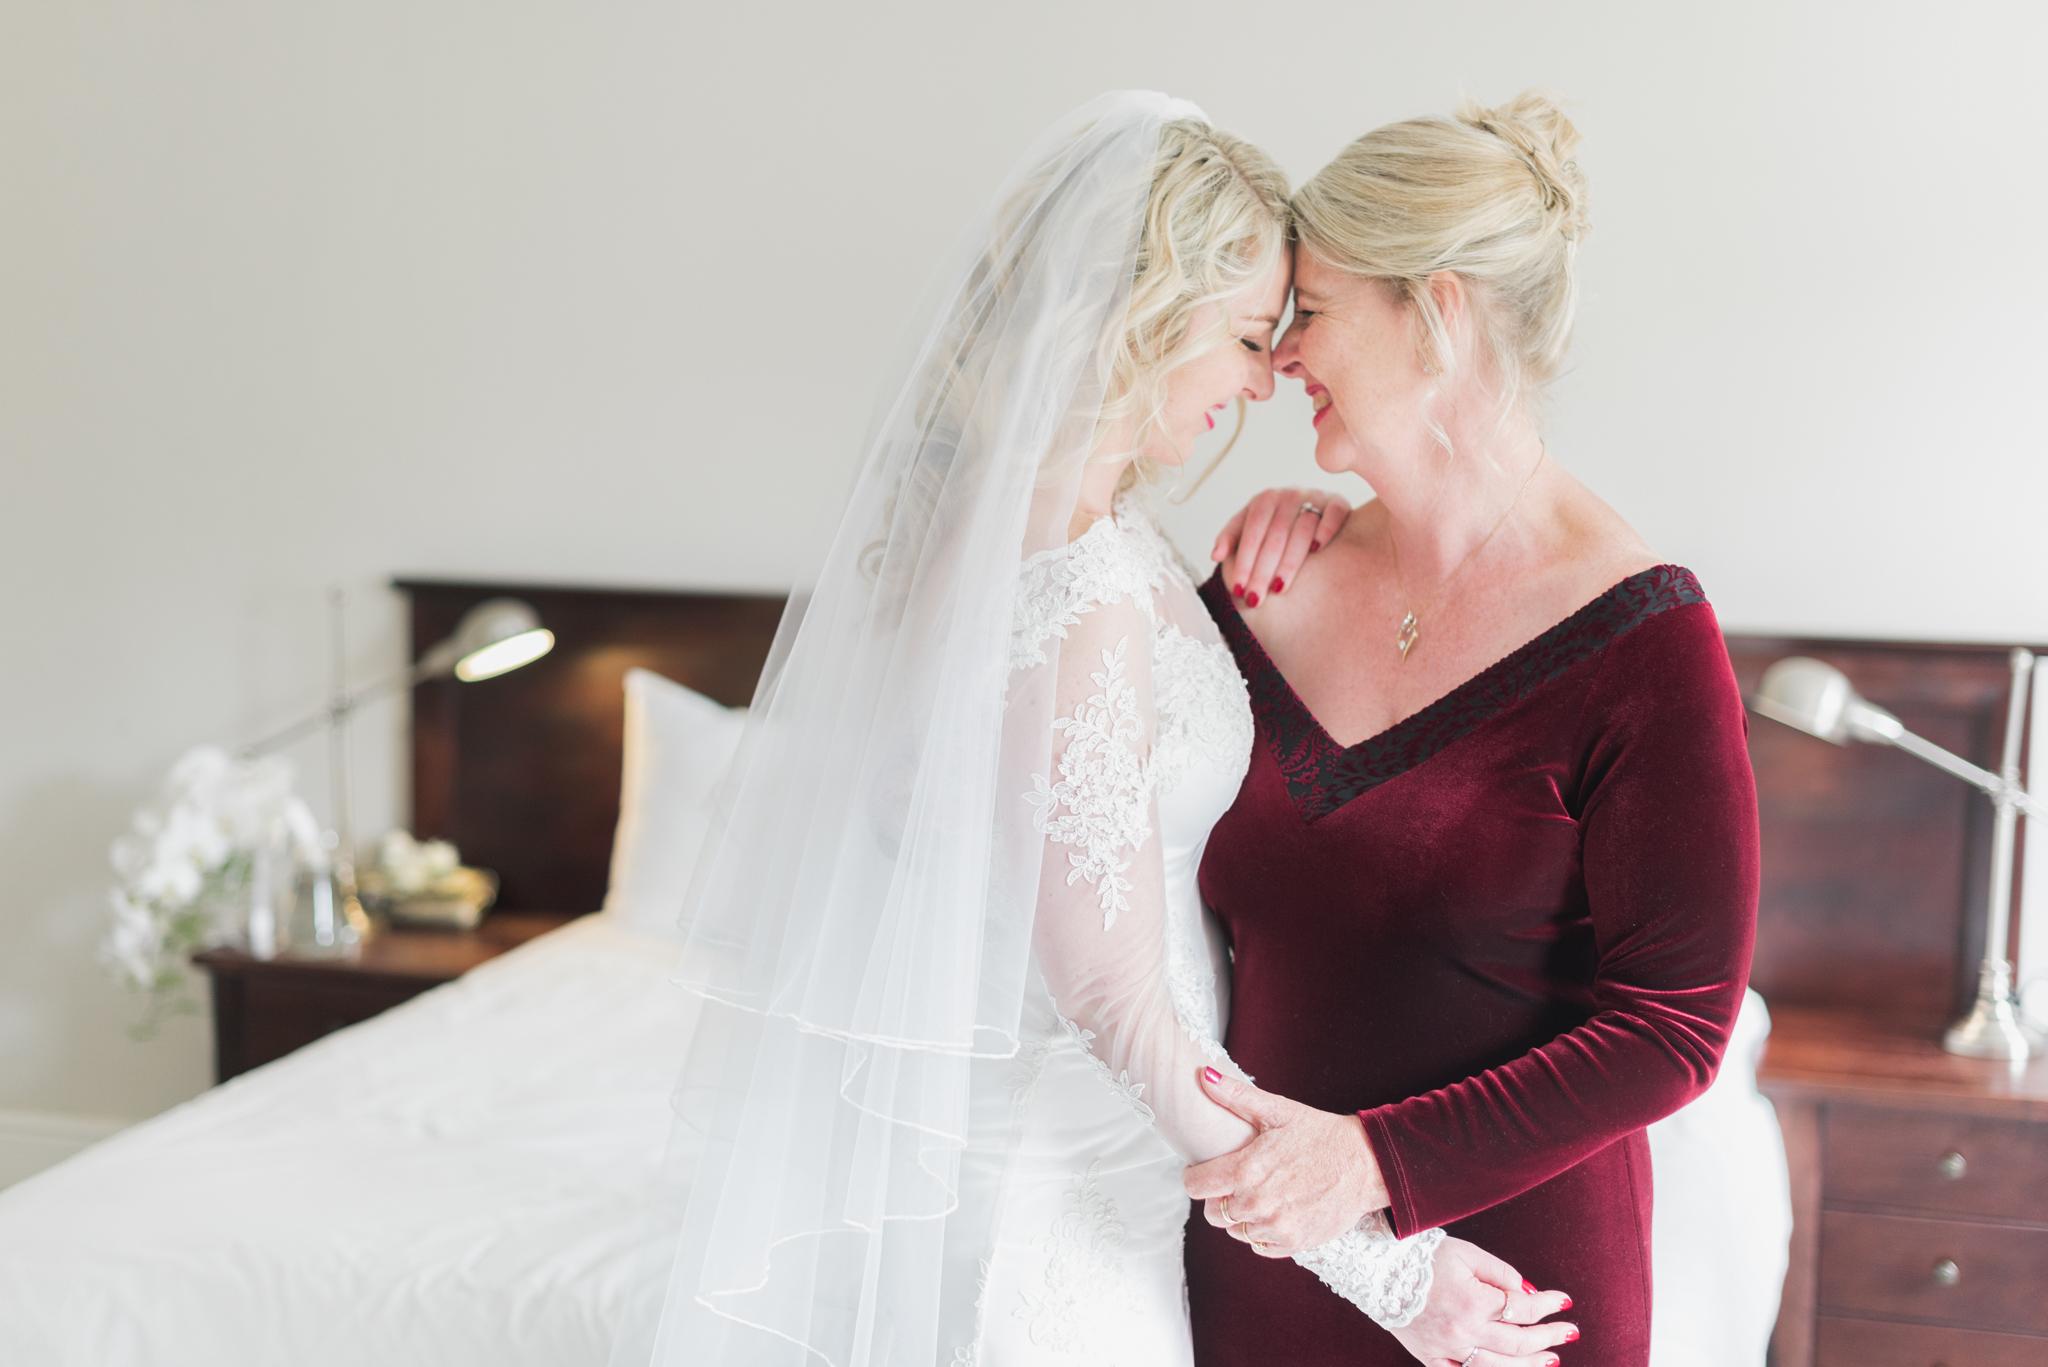 Angelique_Smith_Photography_Pieter&Yvonne_Wedding-138.jpg